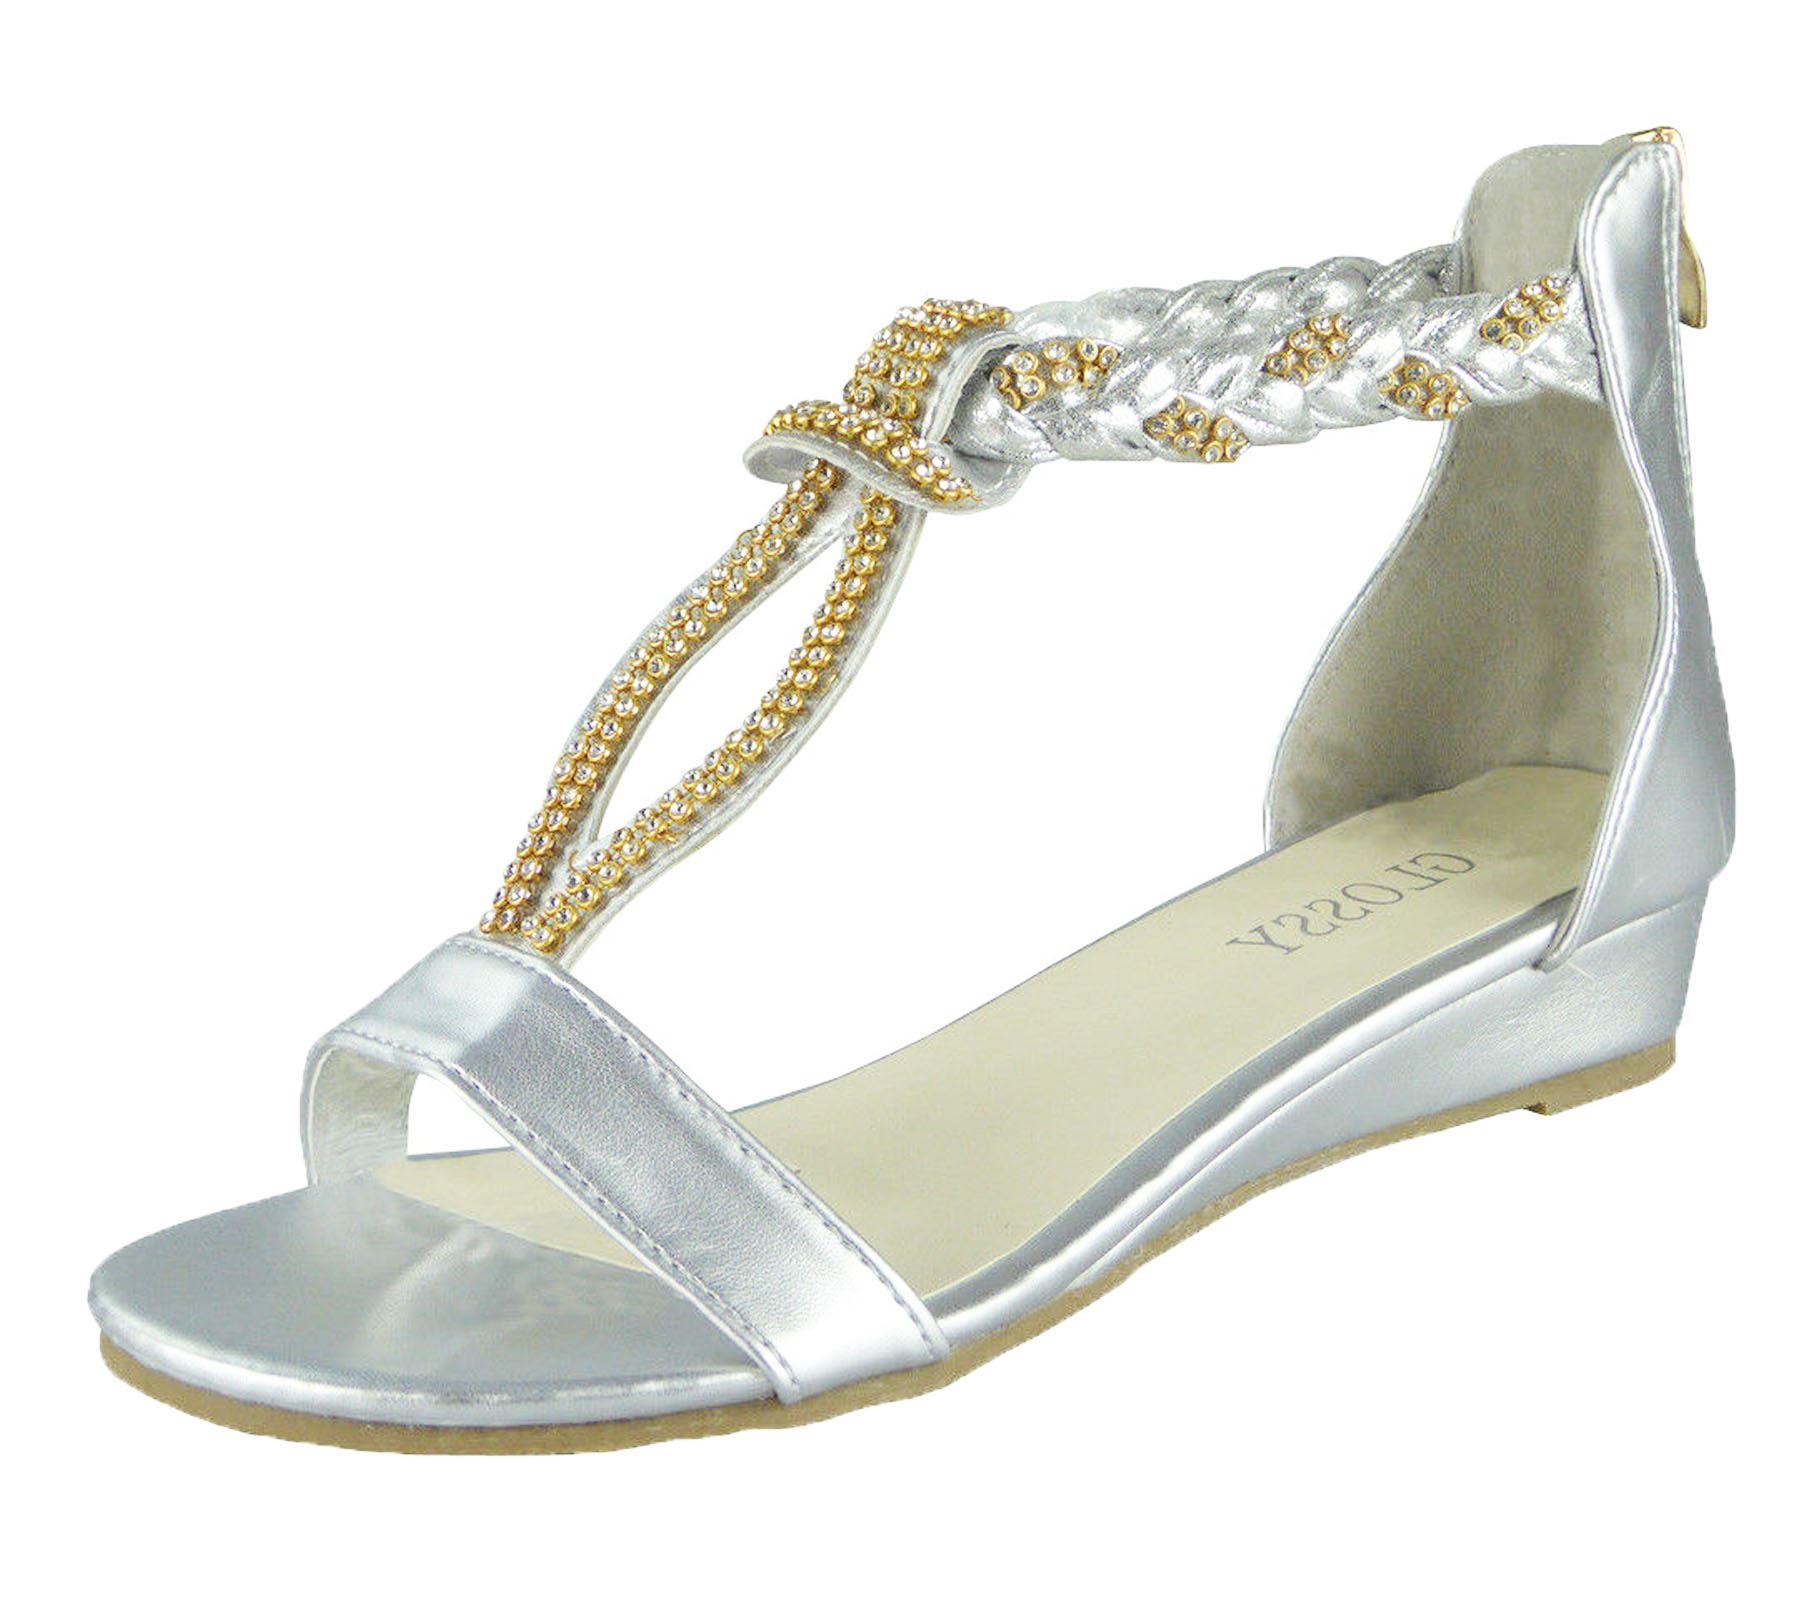 66b9e93baf94 Details about Ladies Sandals Low Wedge Diamante Summer Womens Wedding Fancy  Shoes